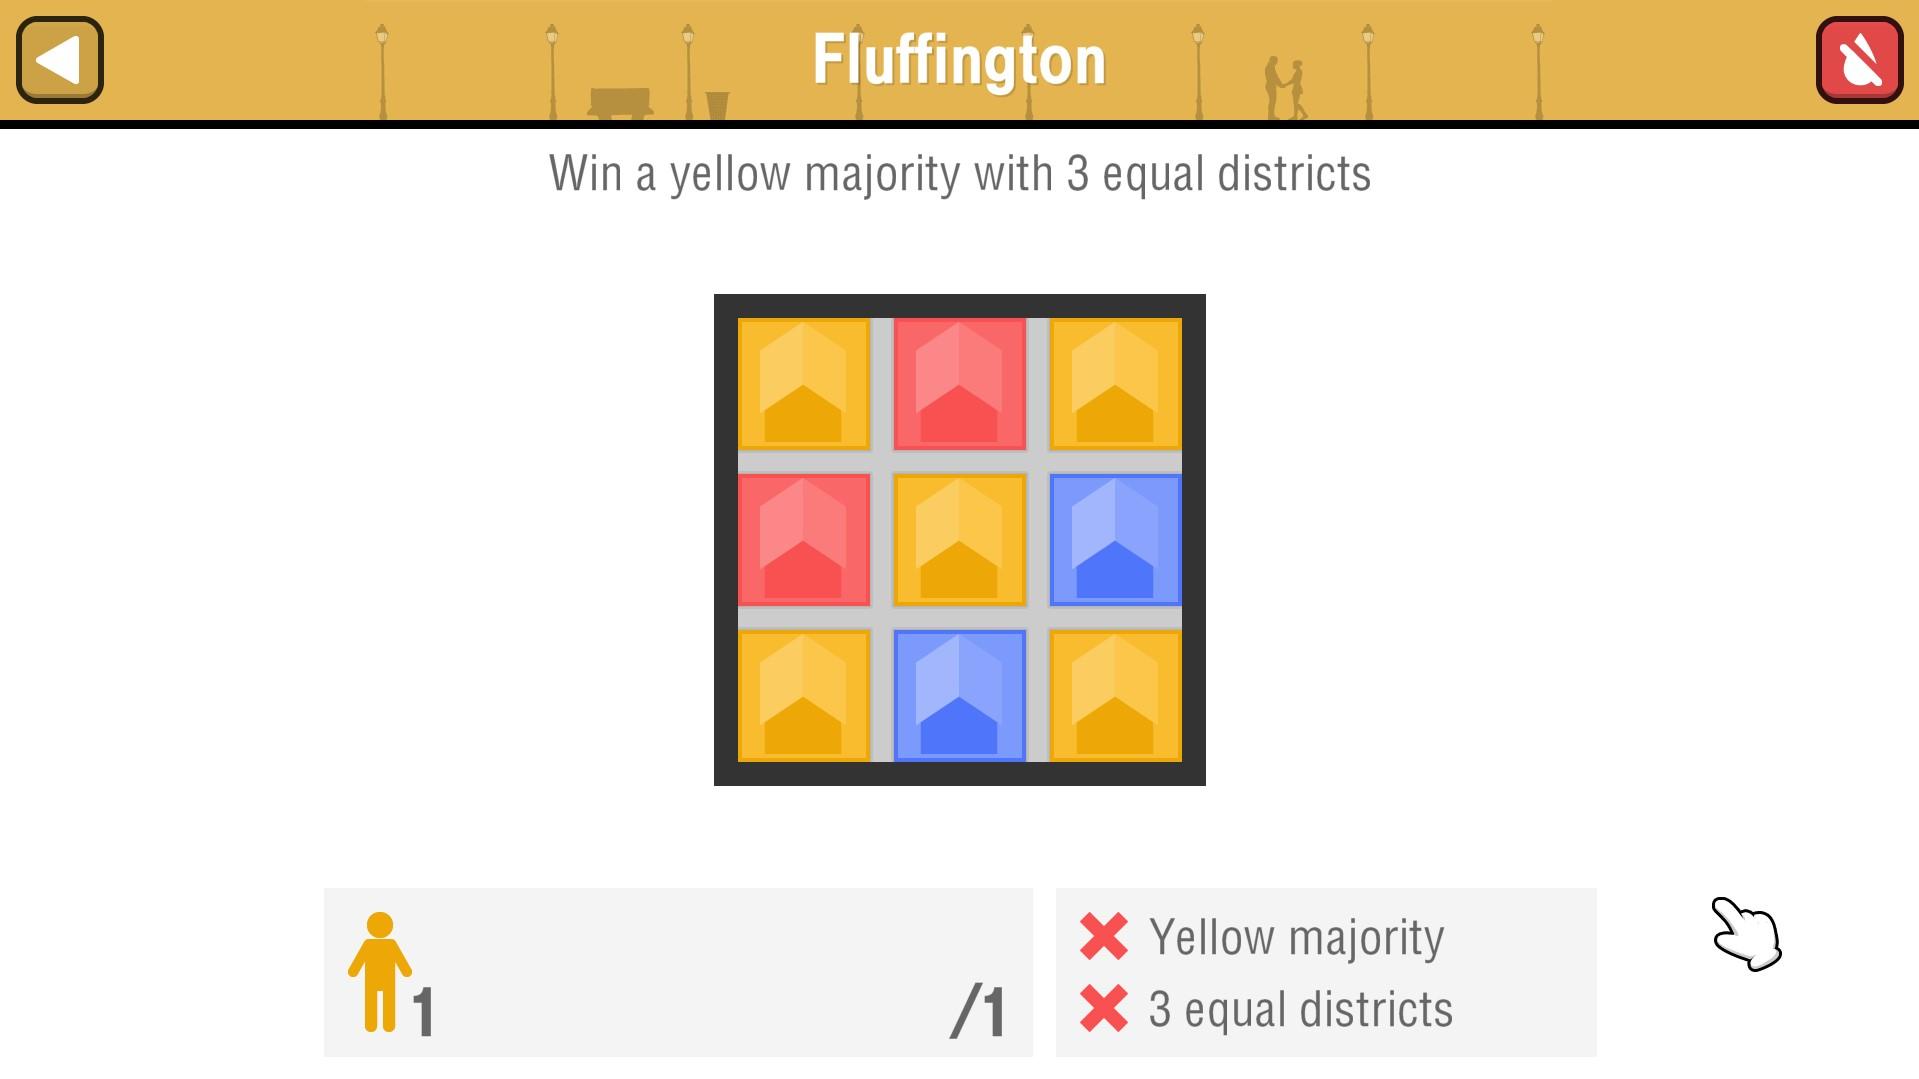 Fluffington